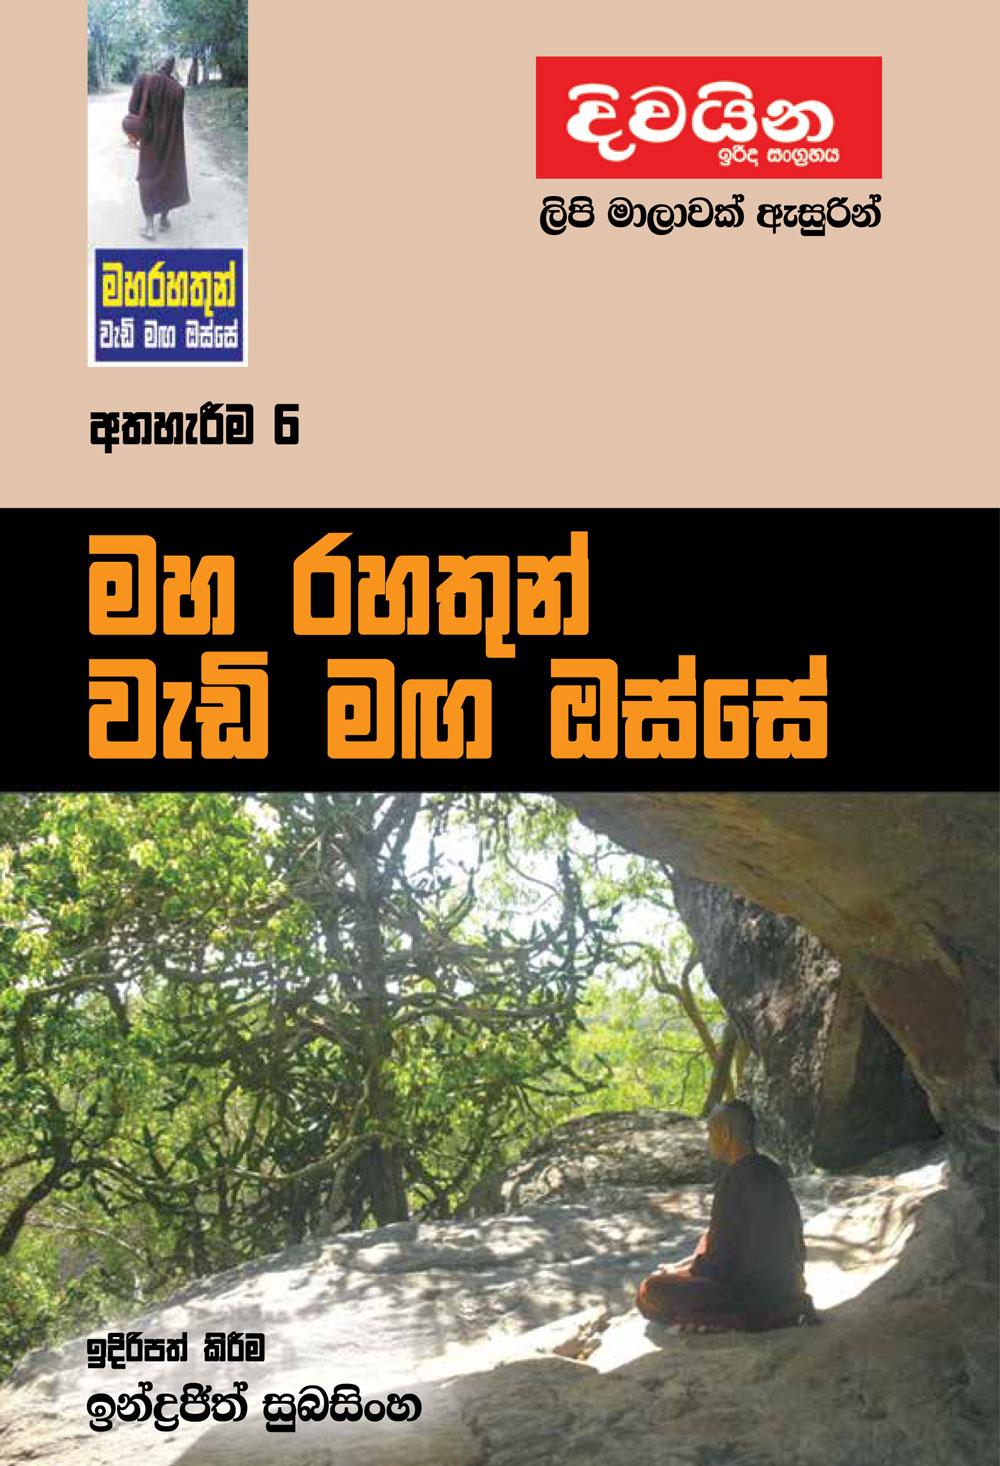 Maha Rahathun Wadi Maga Osse Book 6